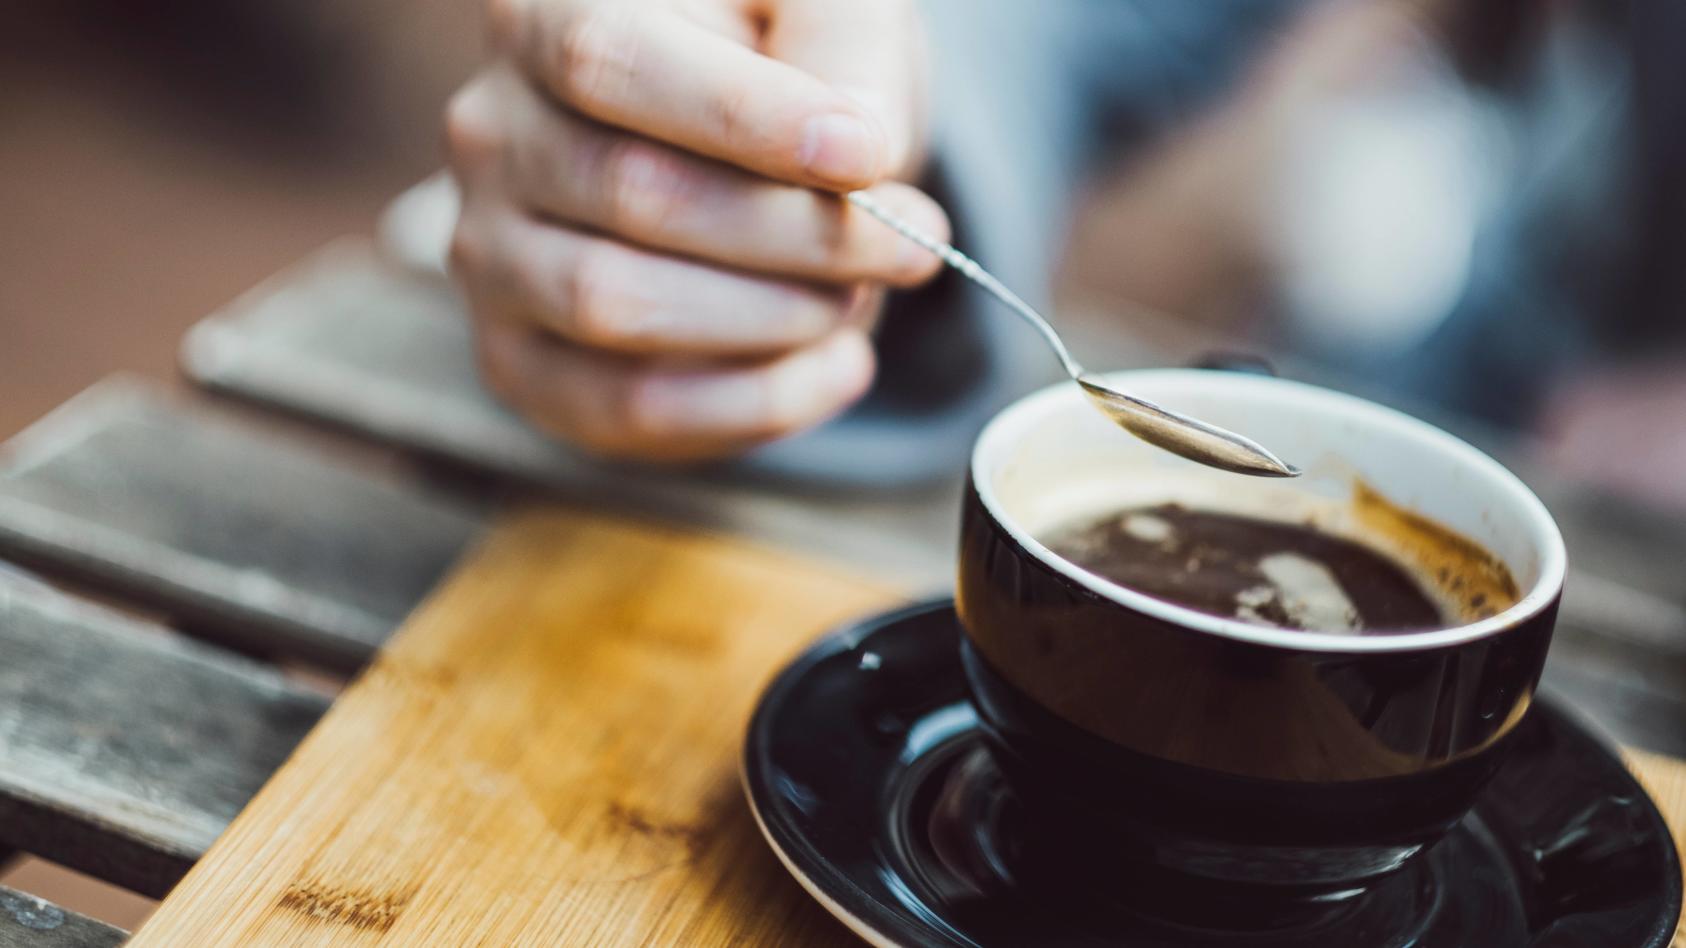 Die medizinische Forschung ist sehr daran interessiert, was Kaffeekonsum bei Menschen langfristig bewirkt.